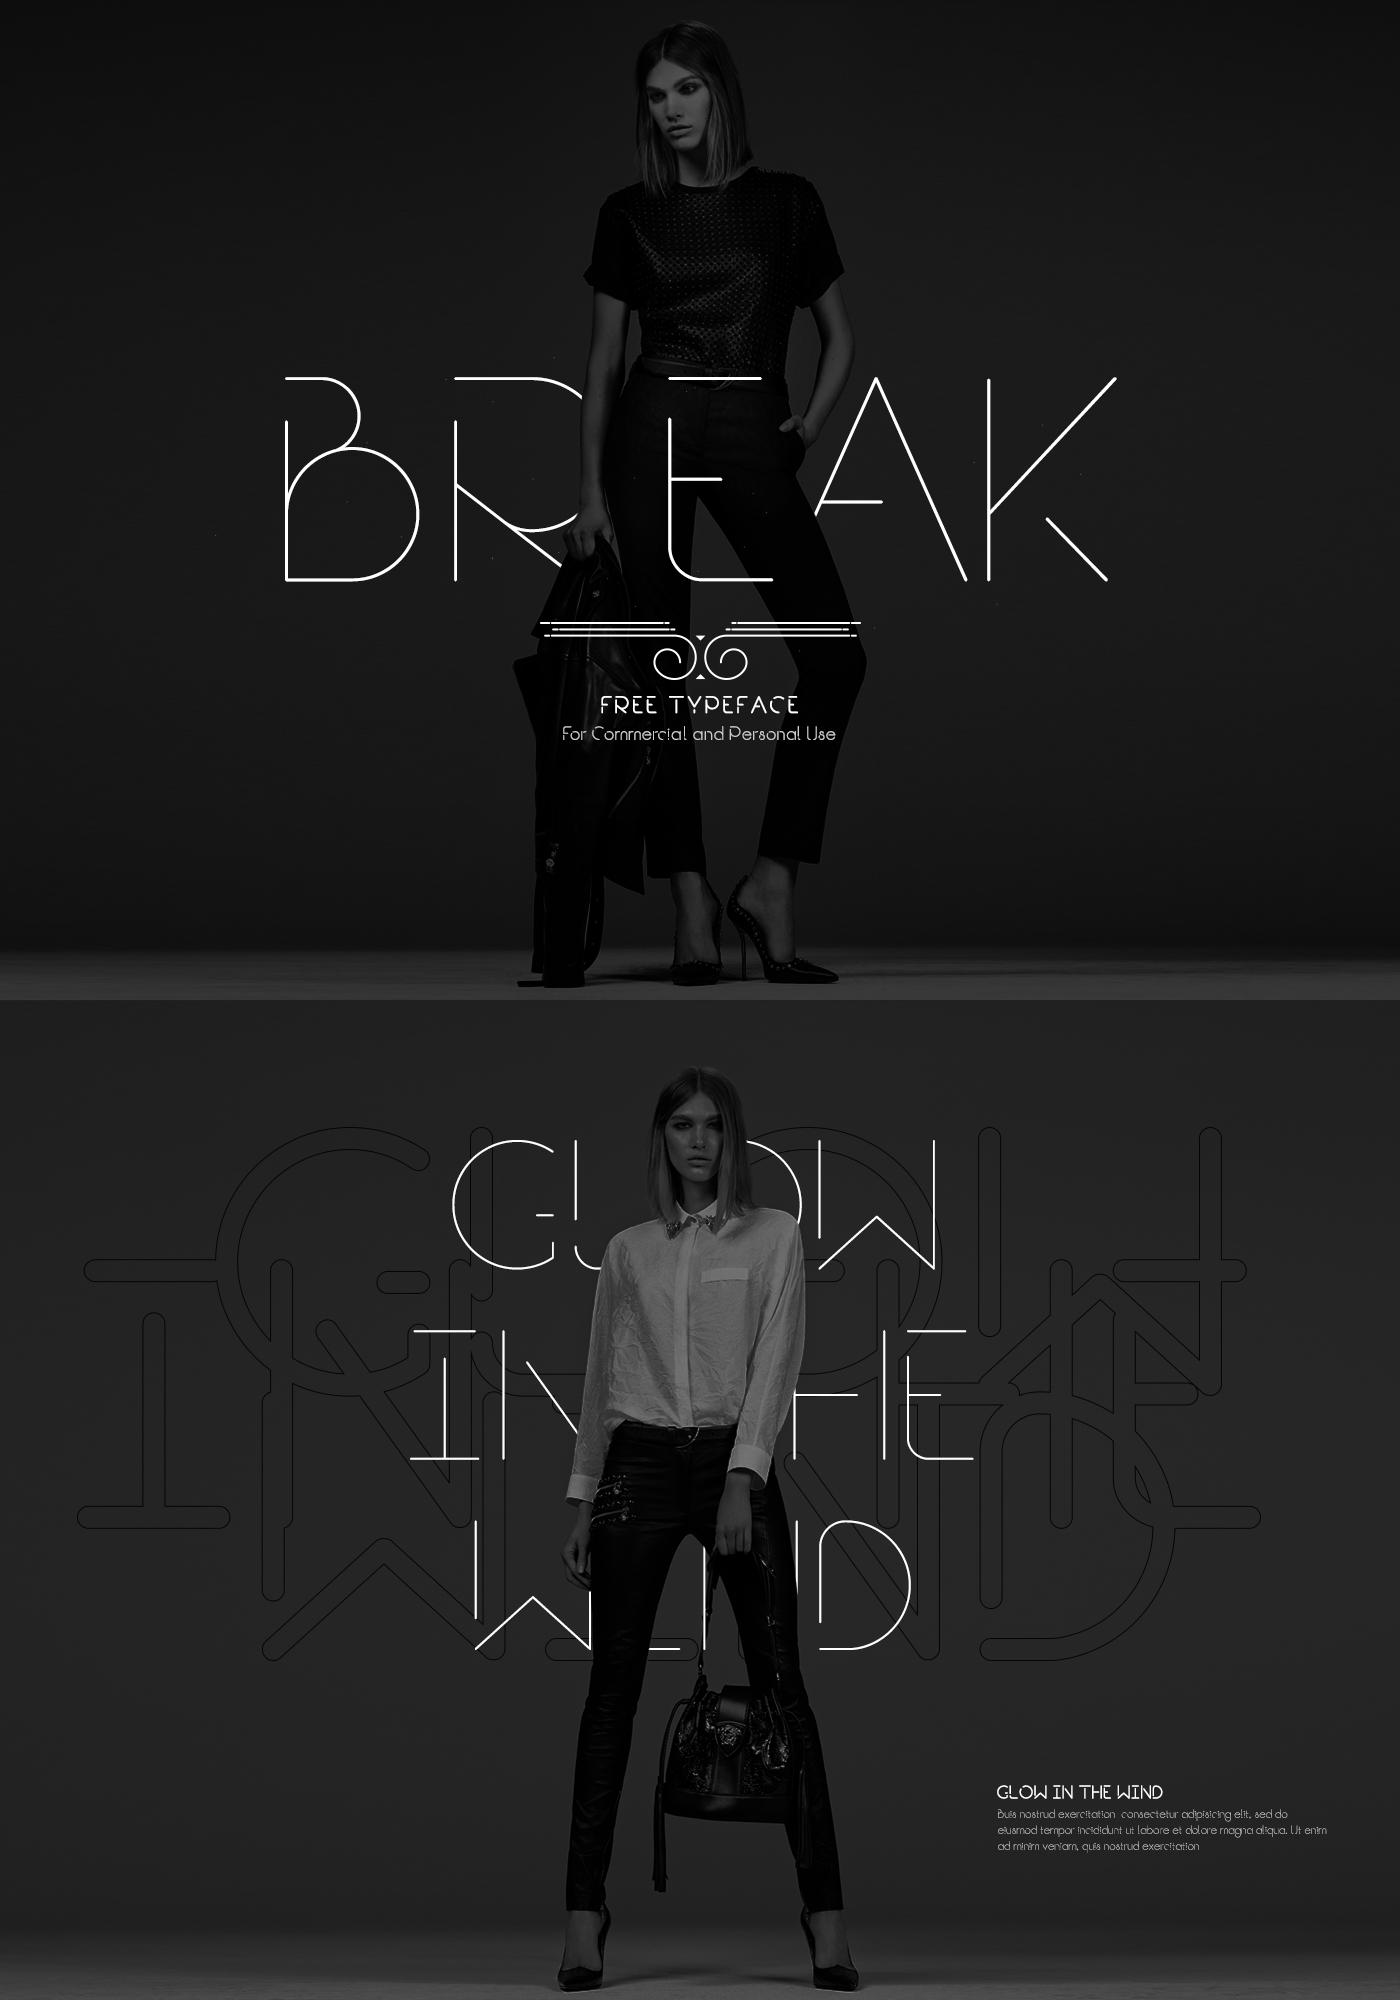 break font,Free font,font,Typeface,free typeface,Fashion Typeface,free typography,Free Typography Design,corporate type,Free Typedesign,free design